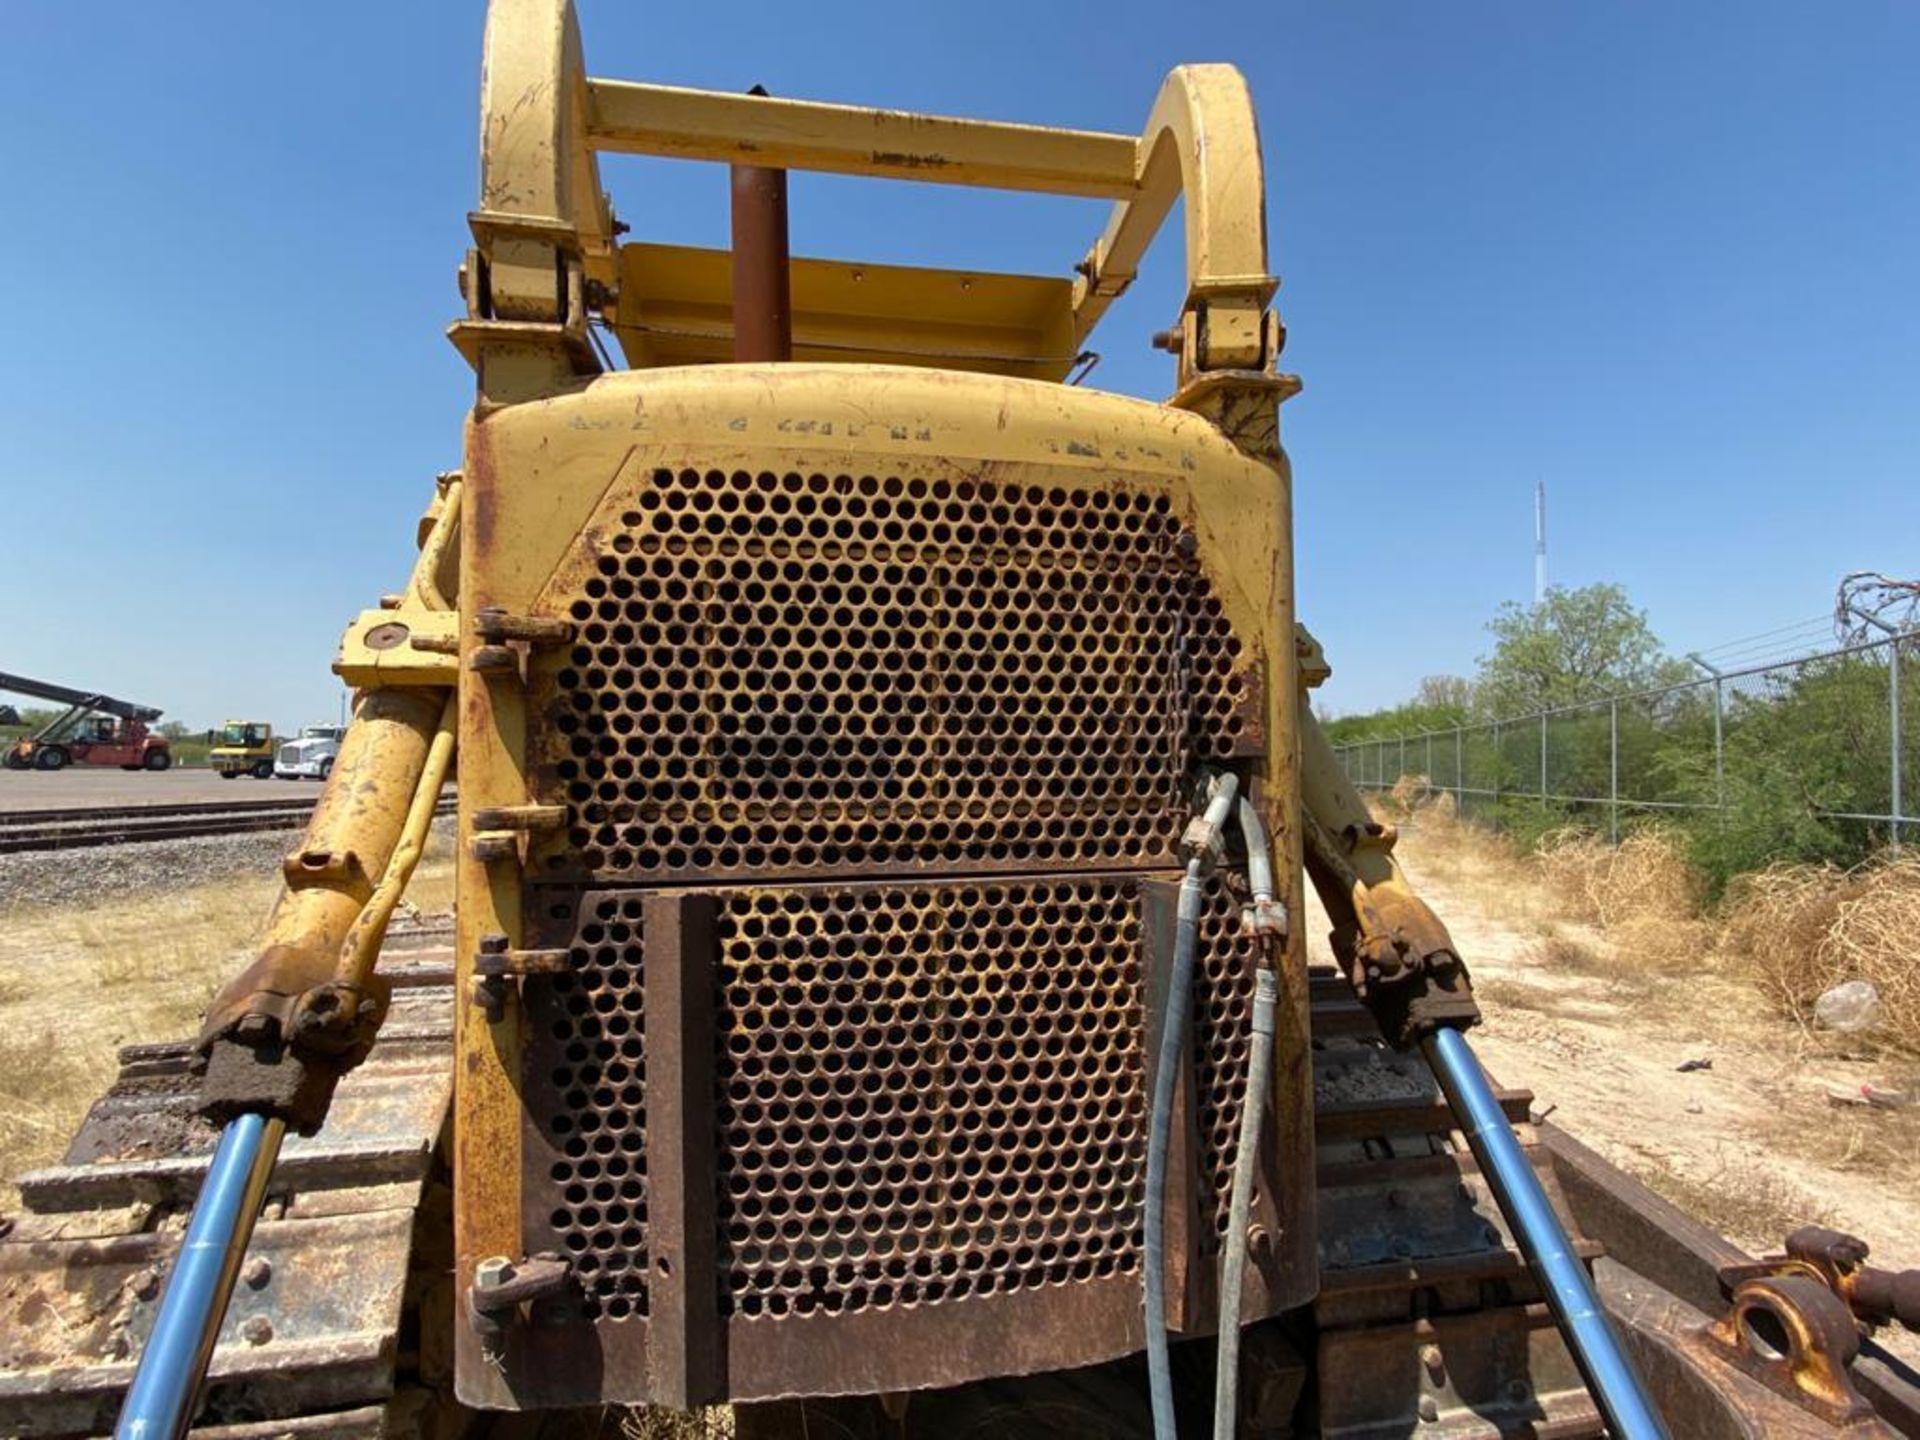 Caterpillar D7G Bulldozer, Serial number 92V5897, Diesel motor - Image 16 of 48